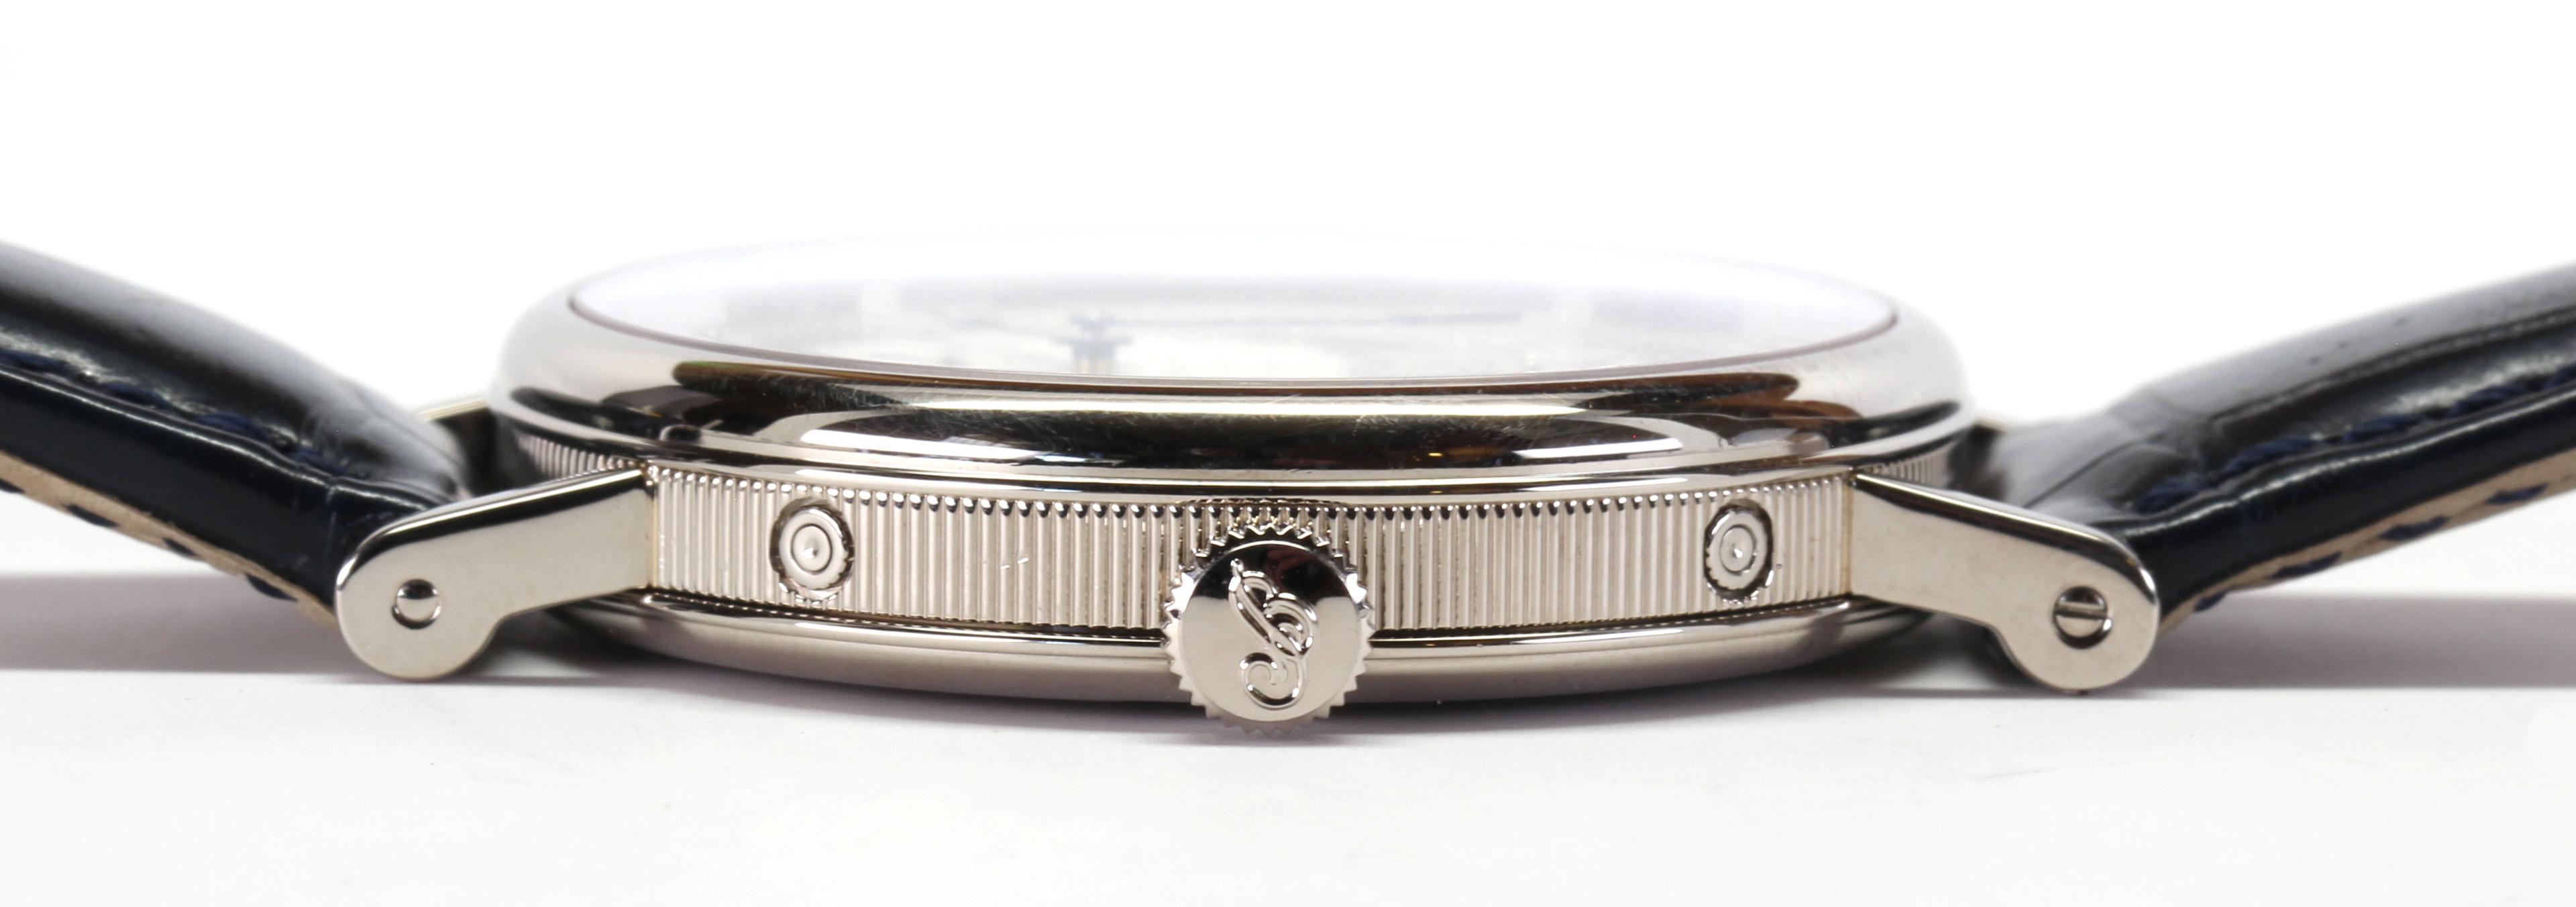 Lot 2879 - Breguet 18k white gold moonphase double calendar wristwatch REF: 7227